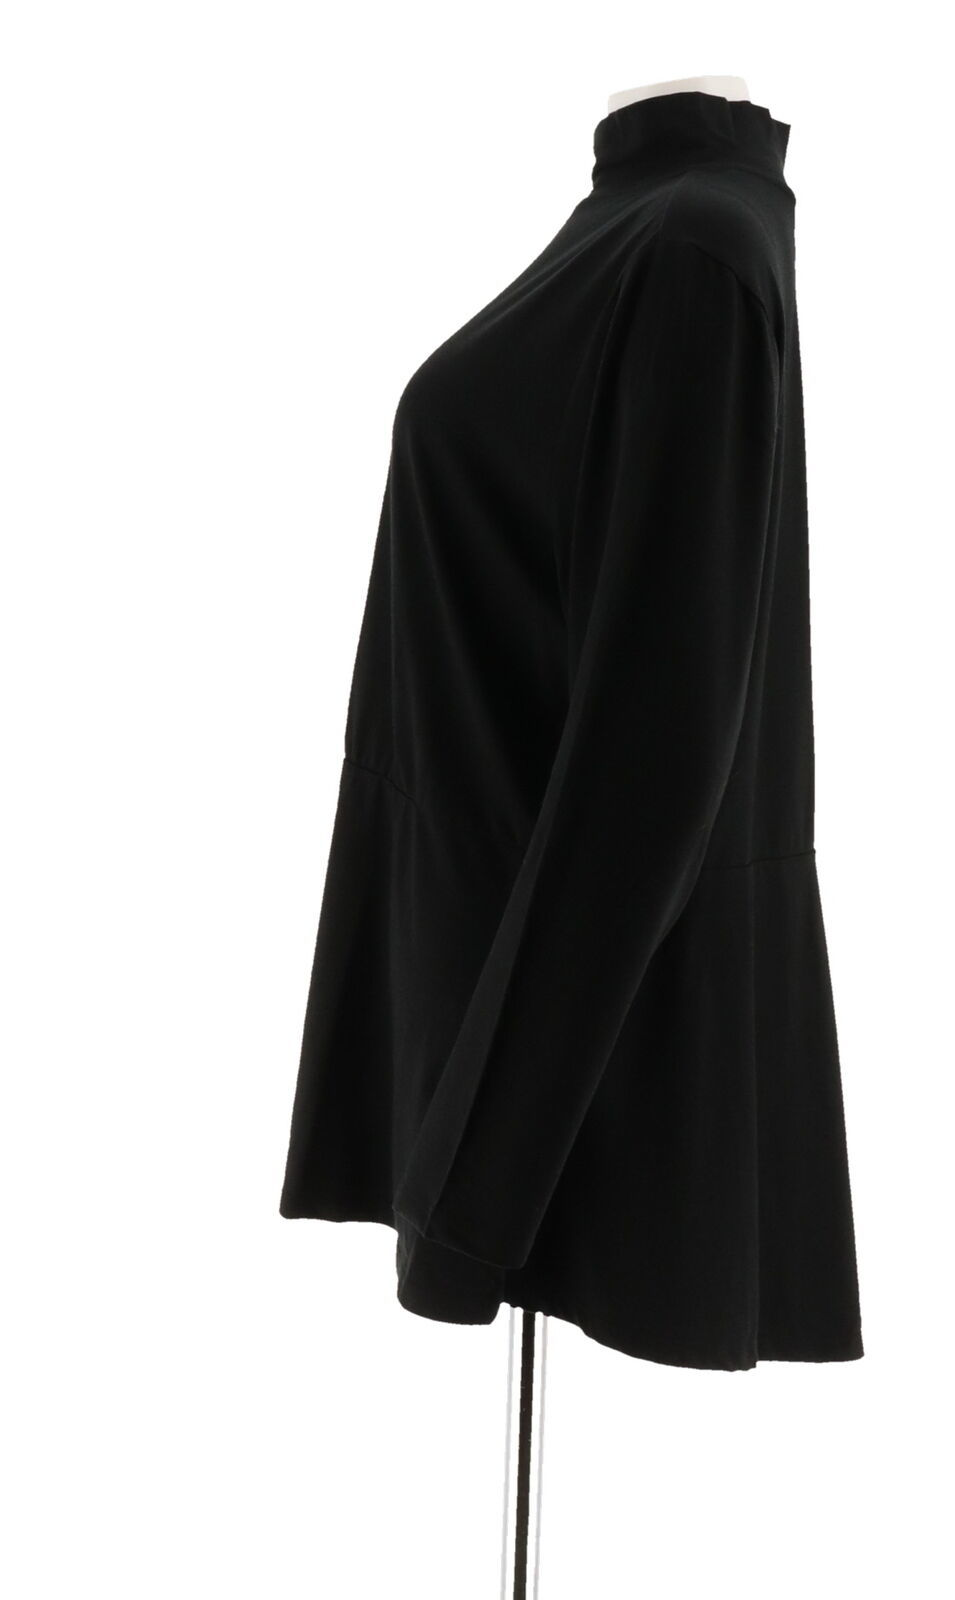 Isaac Mizrahi Knit Mock Neck Long Sleeves Peplum Top Hi-Low Black L NEW A295815